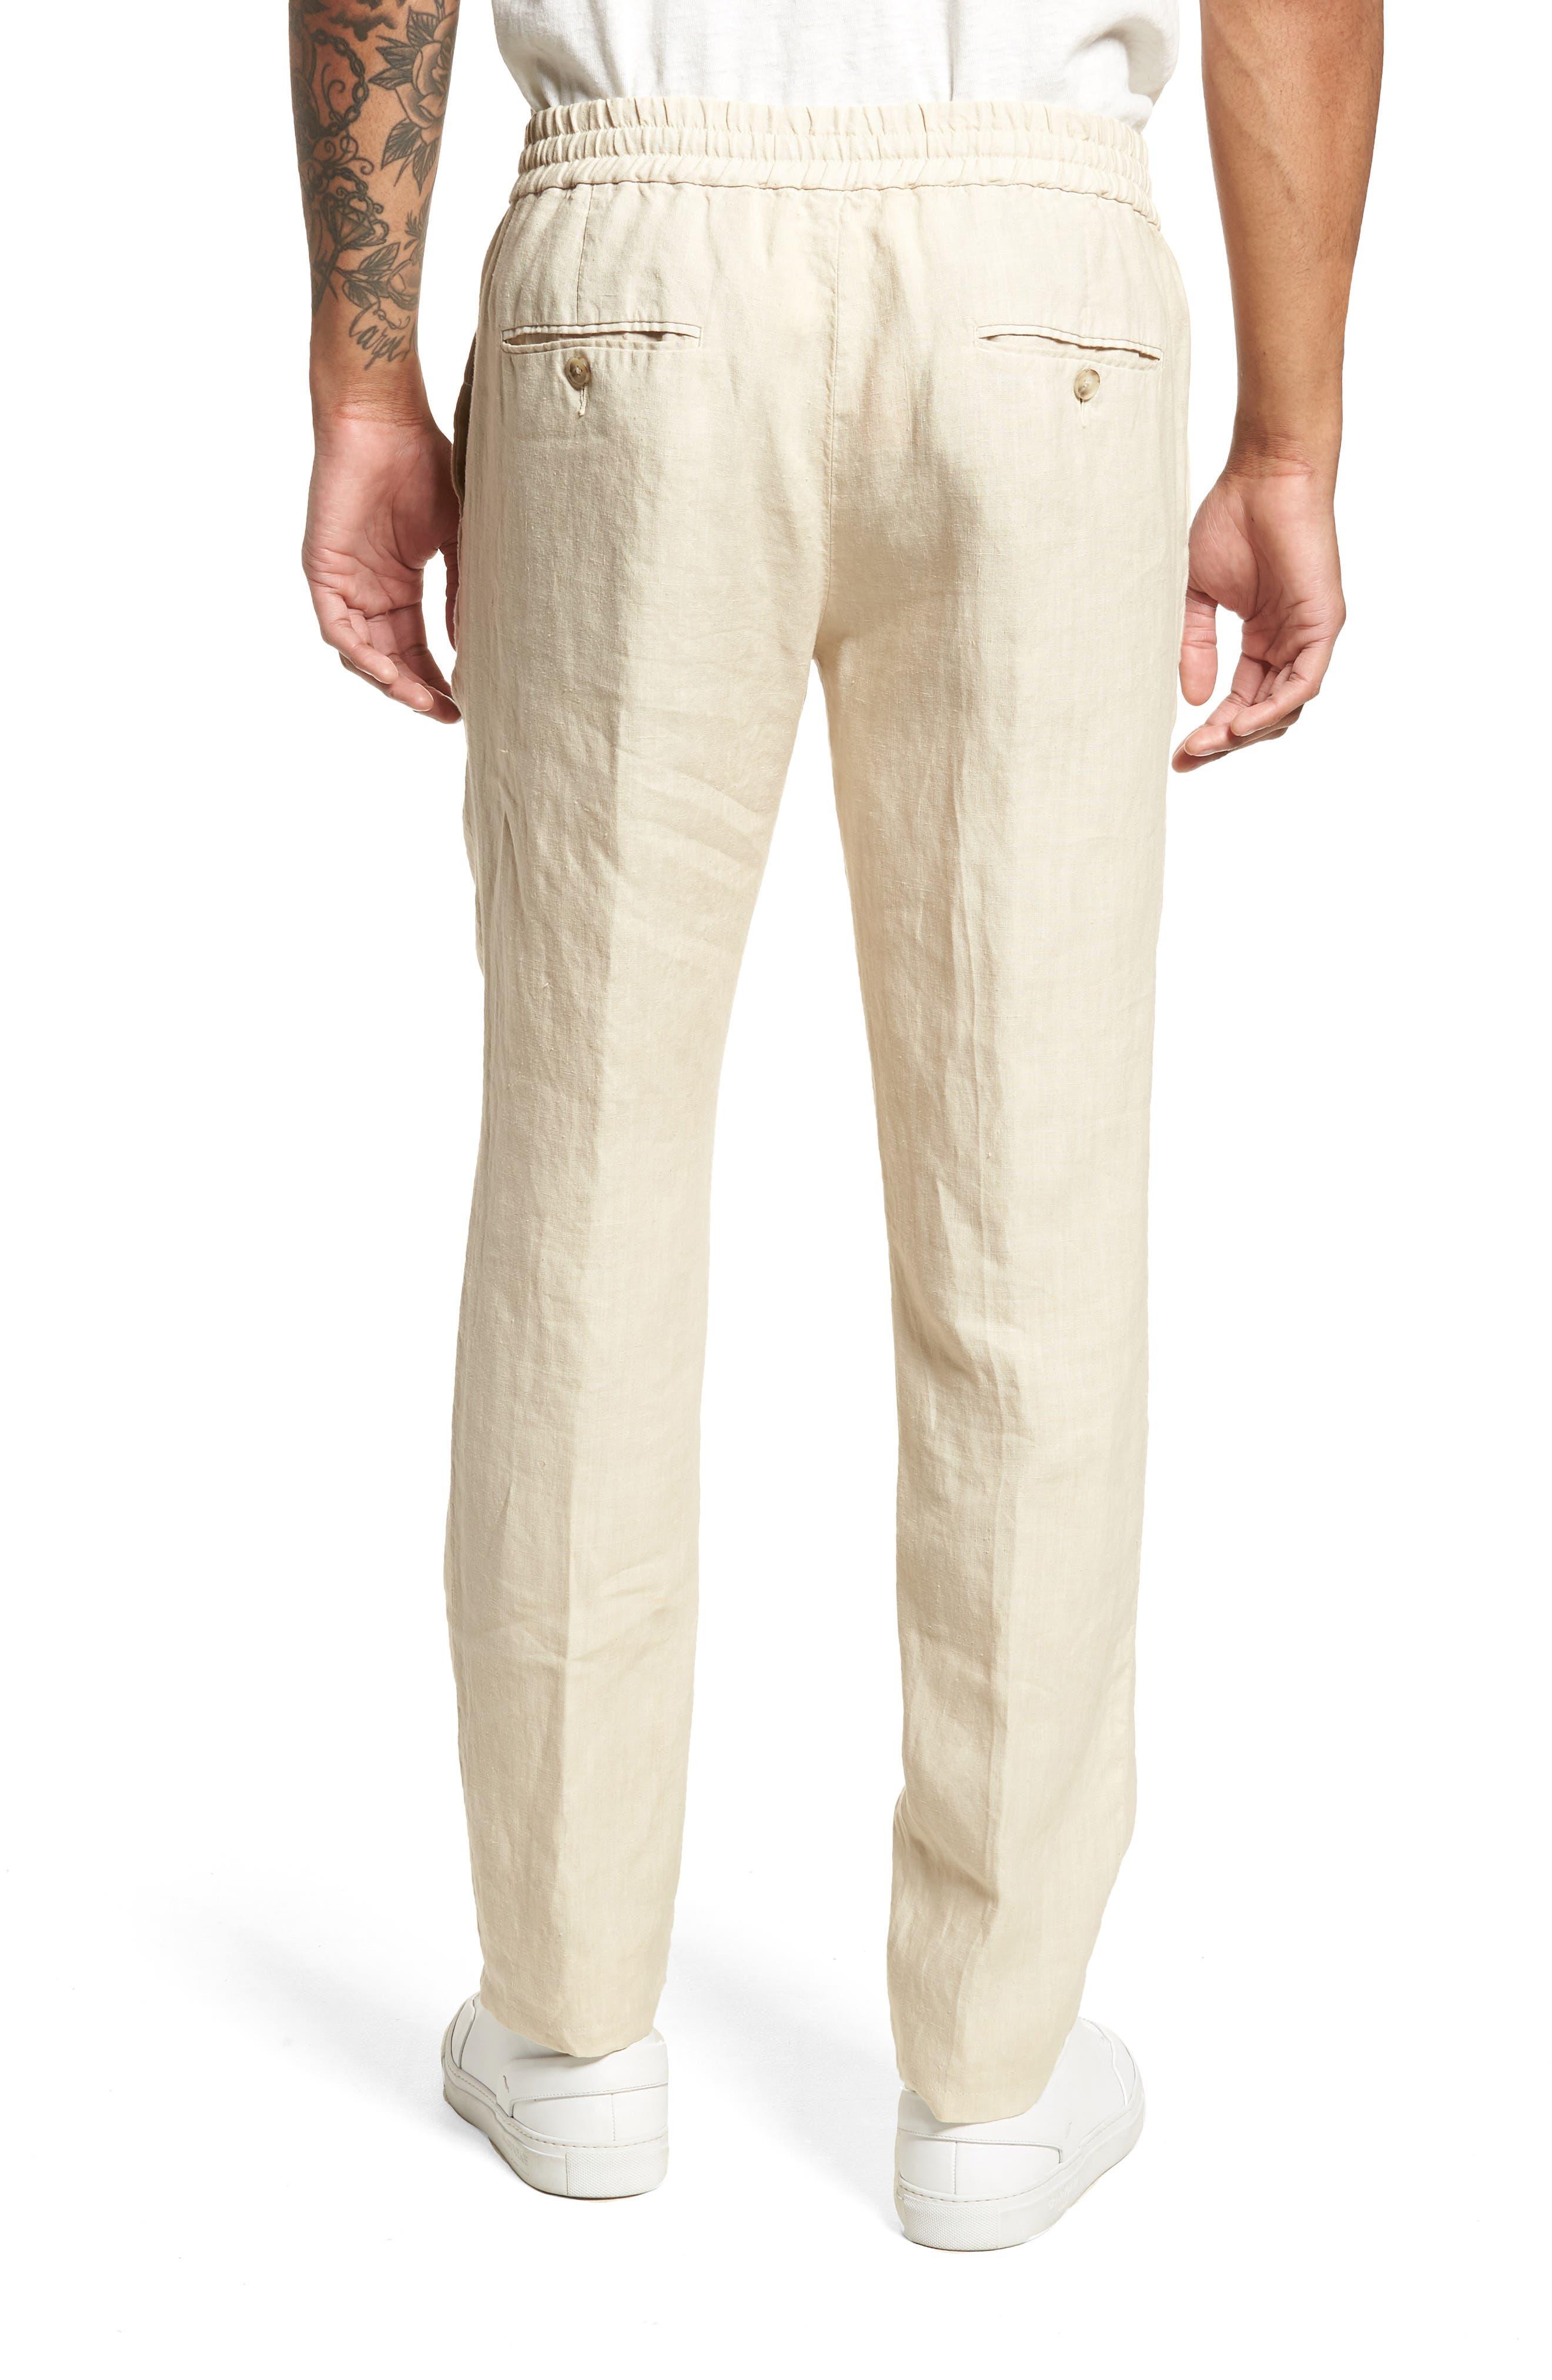 Pintuck Slim Fit Hemp Track Pants,                             Alternate thumbnail 2, color,                             250